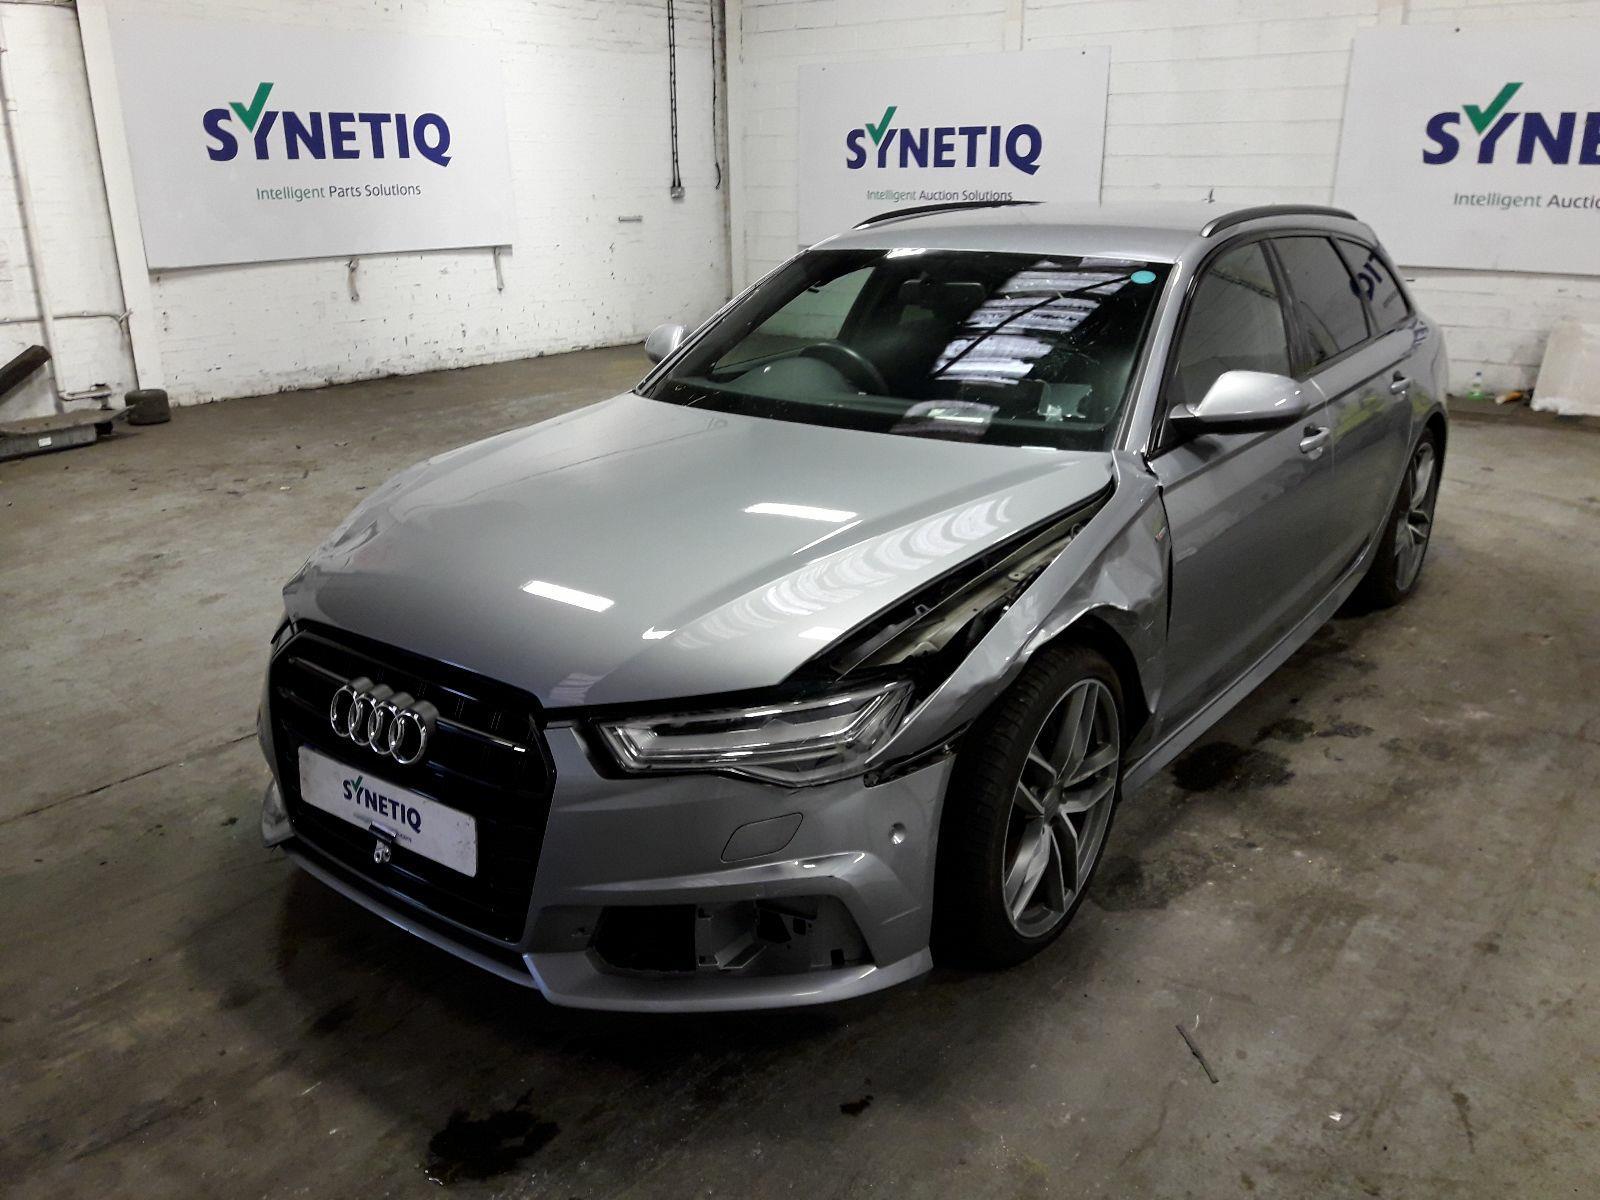 Synetiq 2017 Audi A6 Mk4 Fl 4g C7 2011 On Avant Tdi Ultra S Line Black E 5 Door Estate Diesel Semi Auto Breaking For Used And Spare Parts